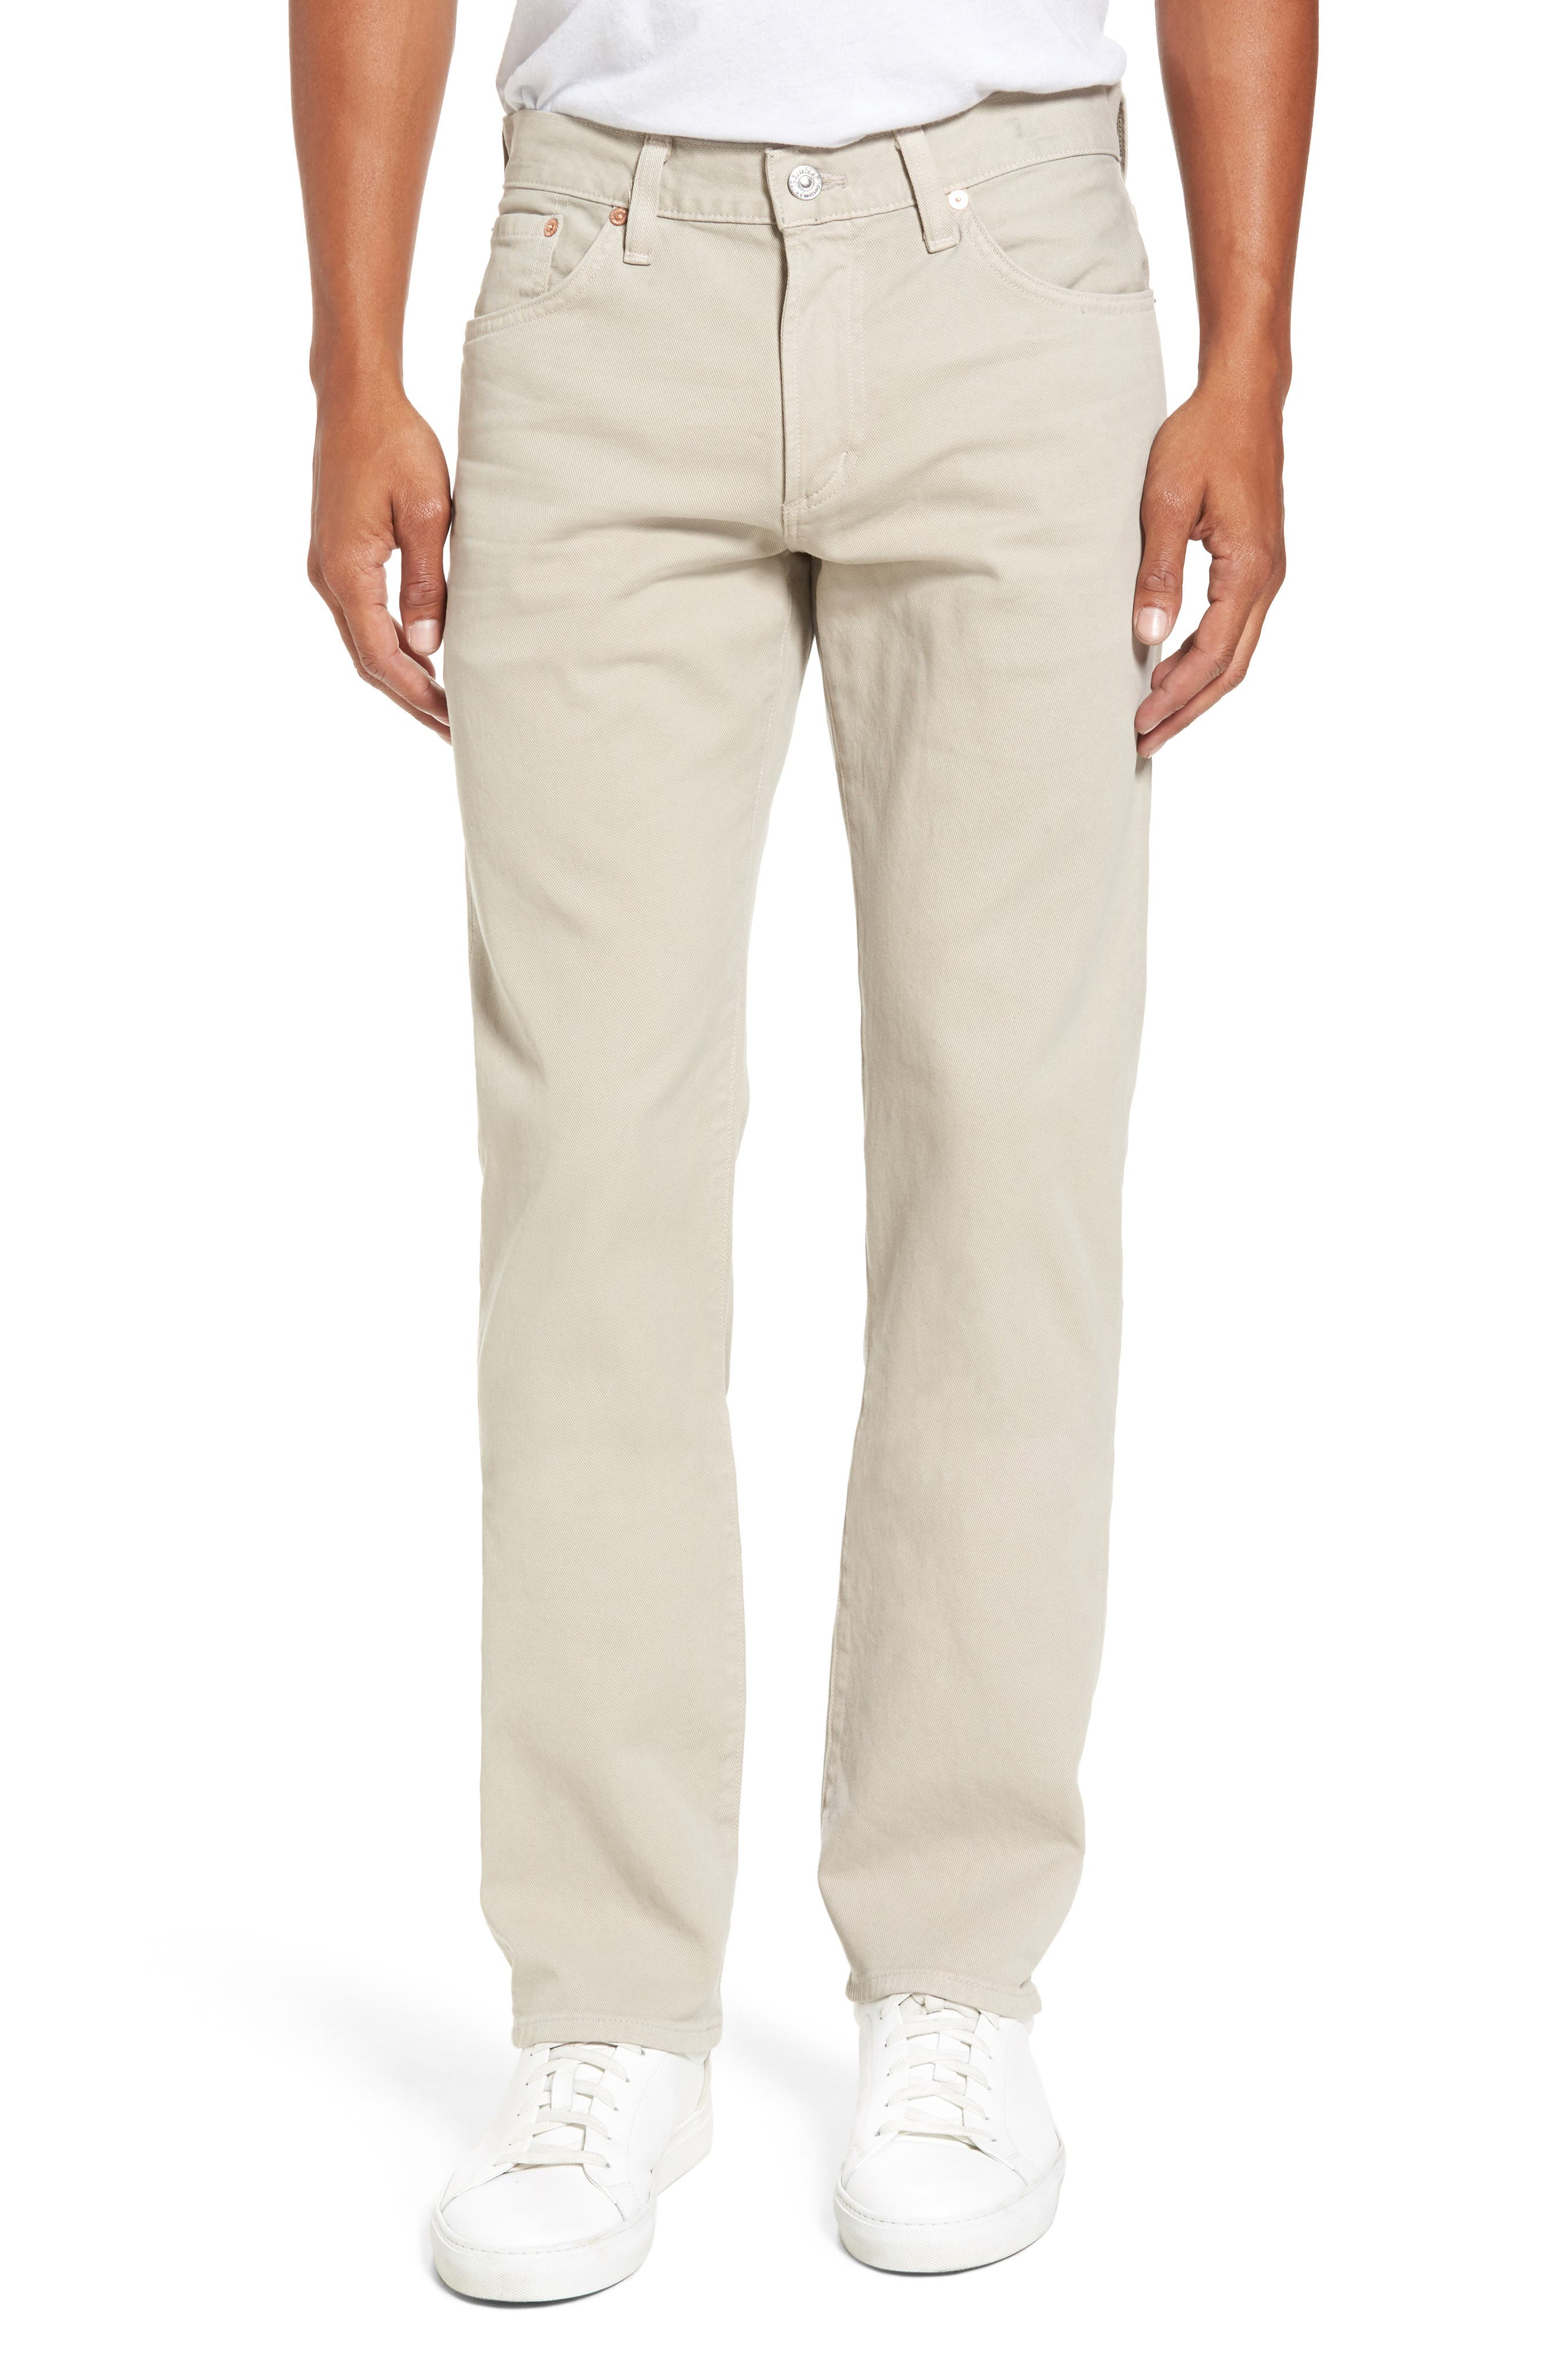 Citizens of Humanity Core Slim Fit Jeans (Parchment)